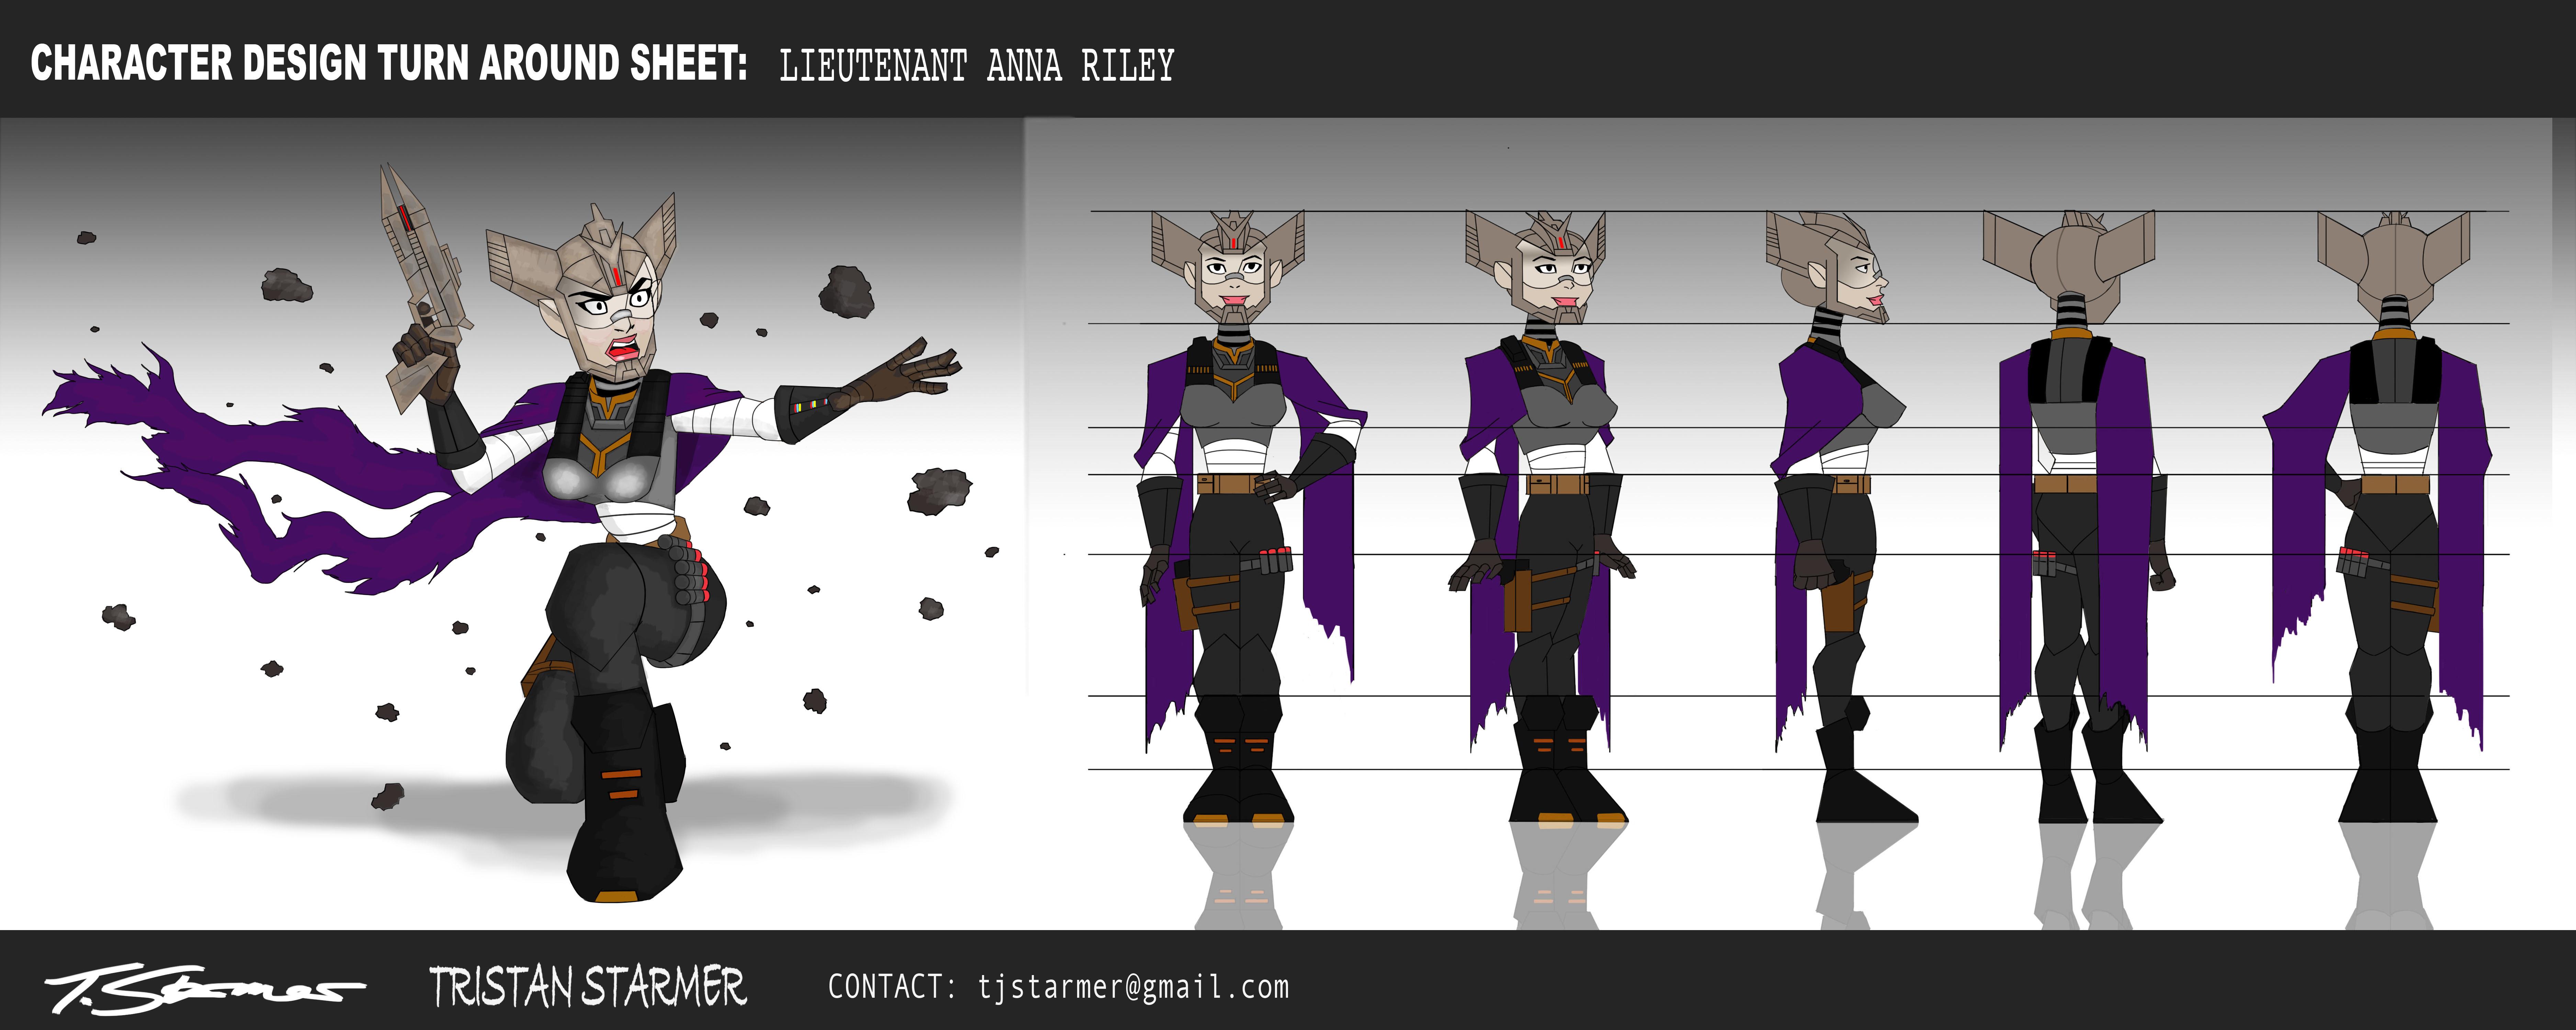 Character Design Vancouver : Character design turn around sheet lieutenant anna